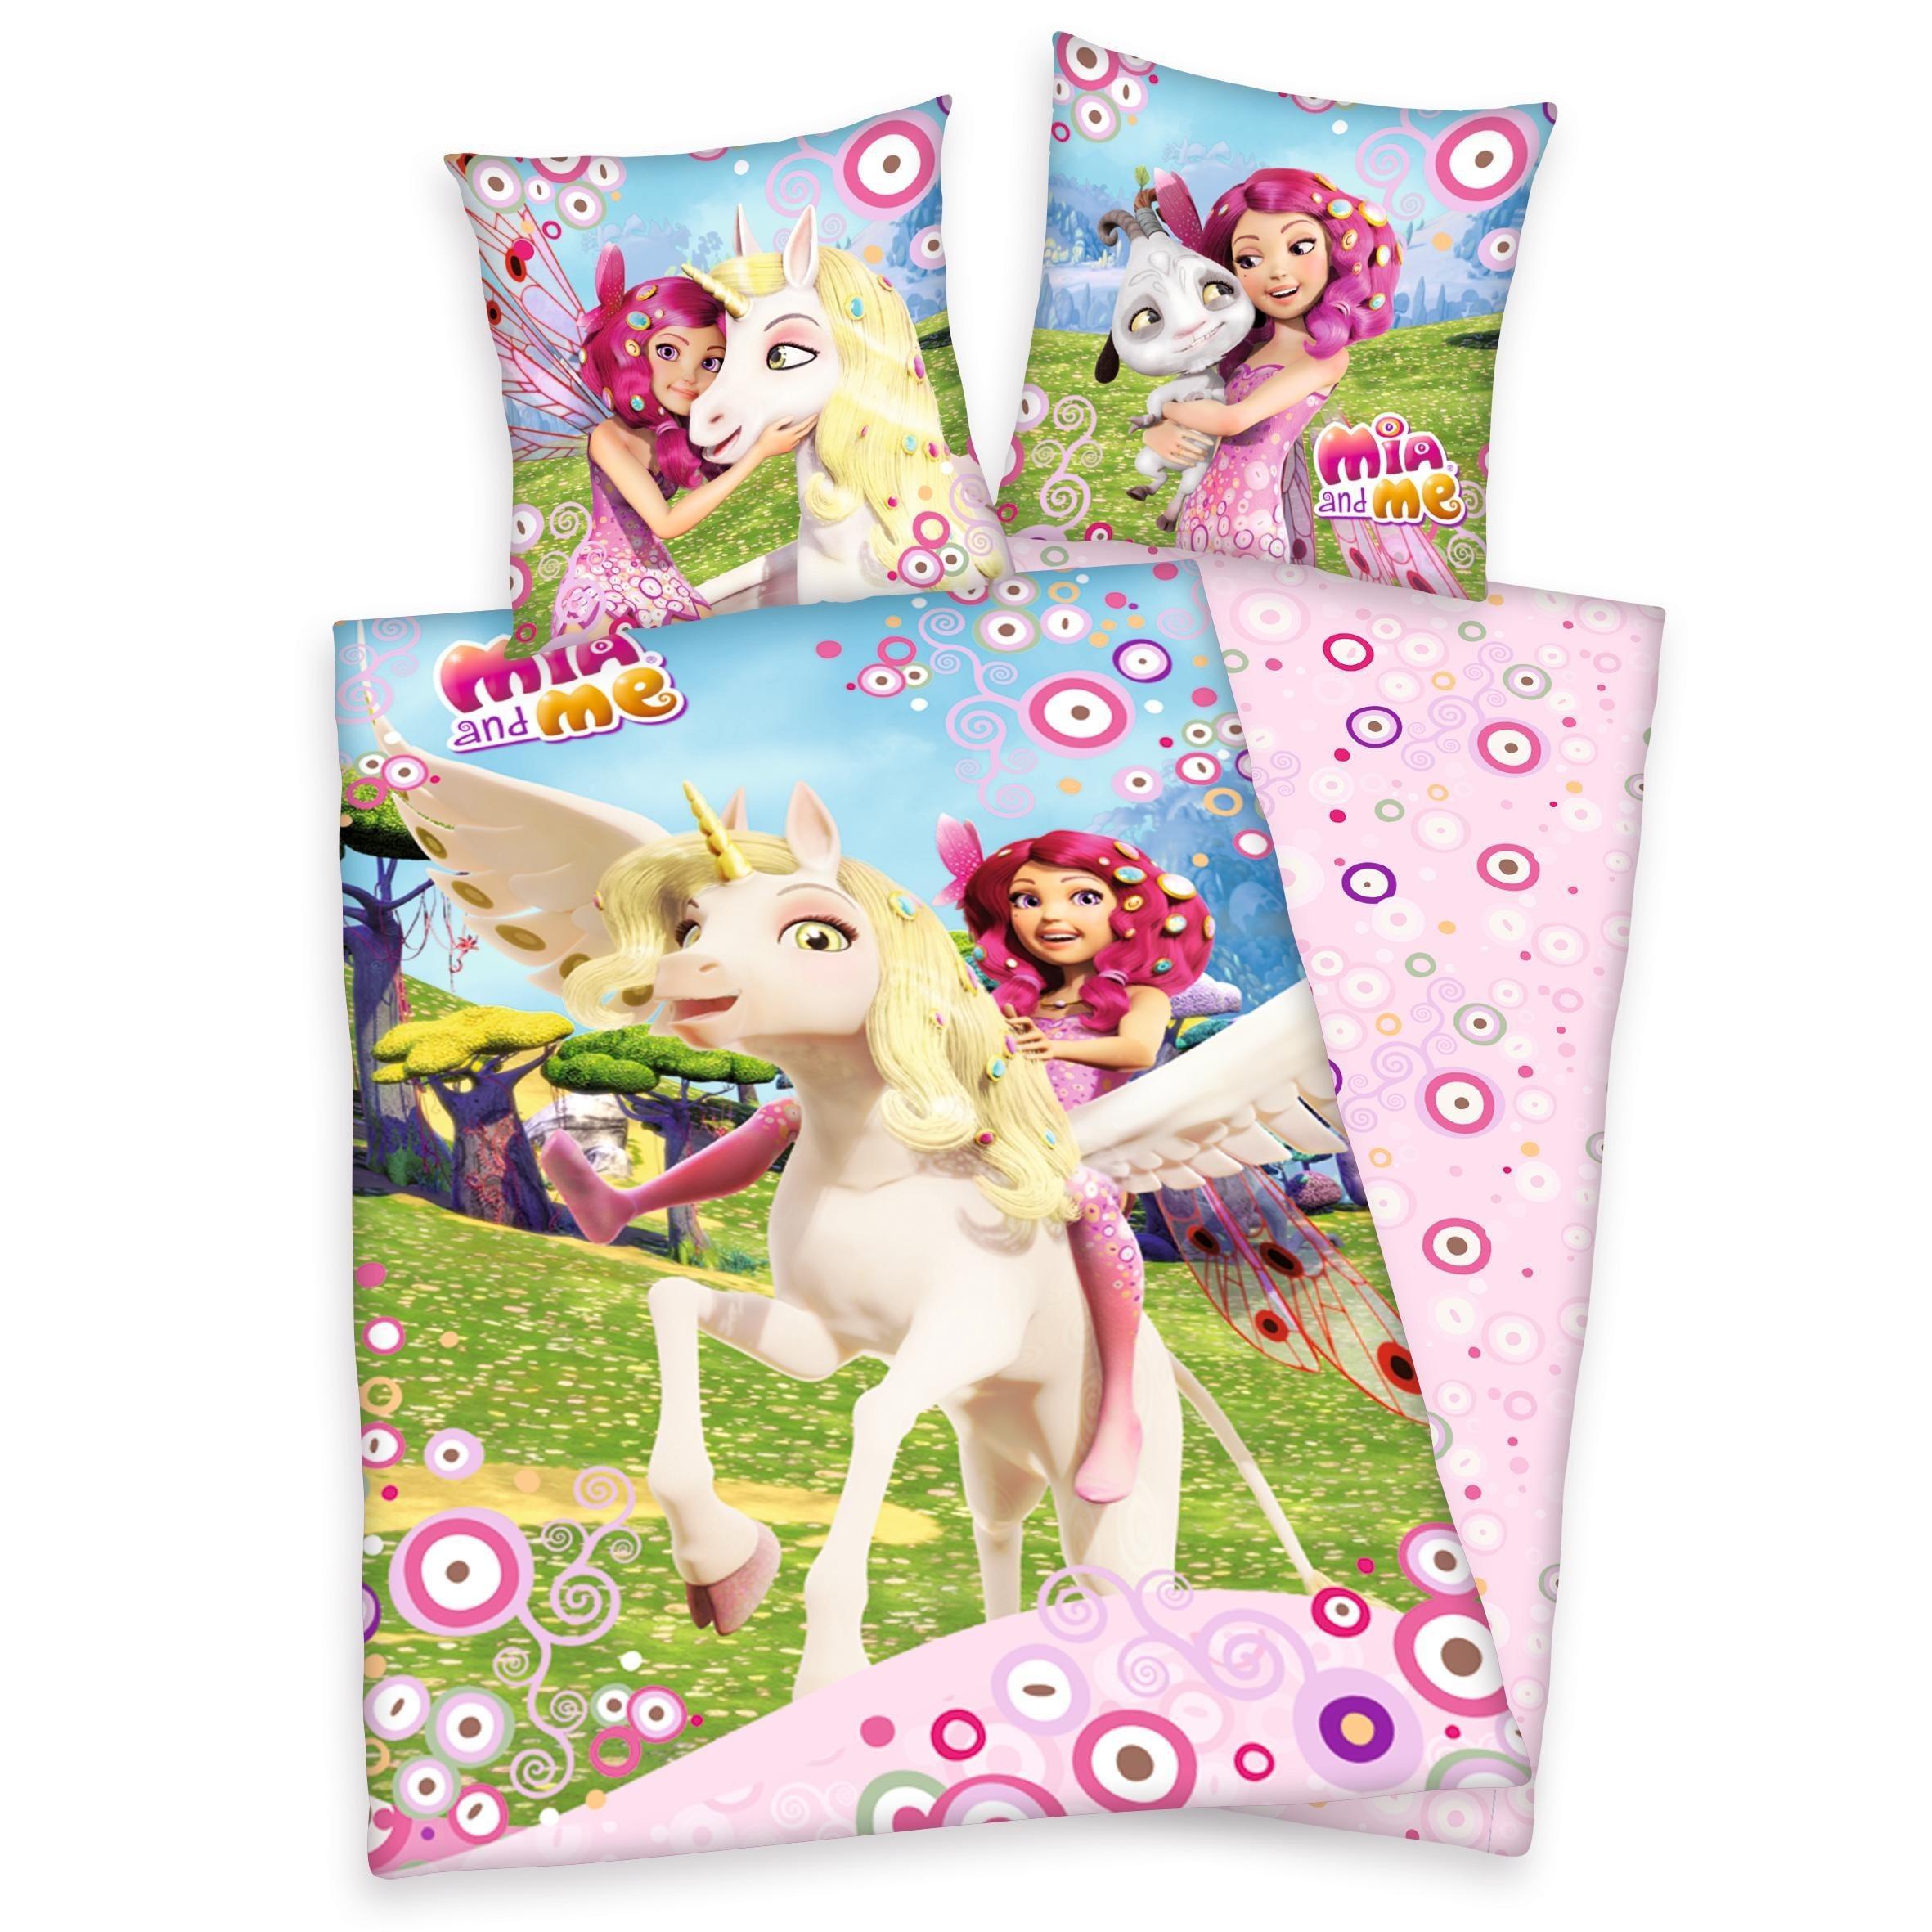 Kinderbettwäsche »Centopia«, mit Kreisen | Kinderzimmer > Textilien für Kinder > Kinderbettwäsche